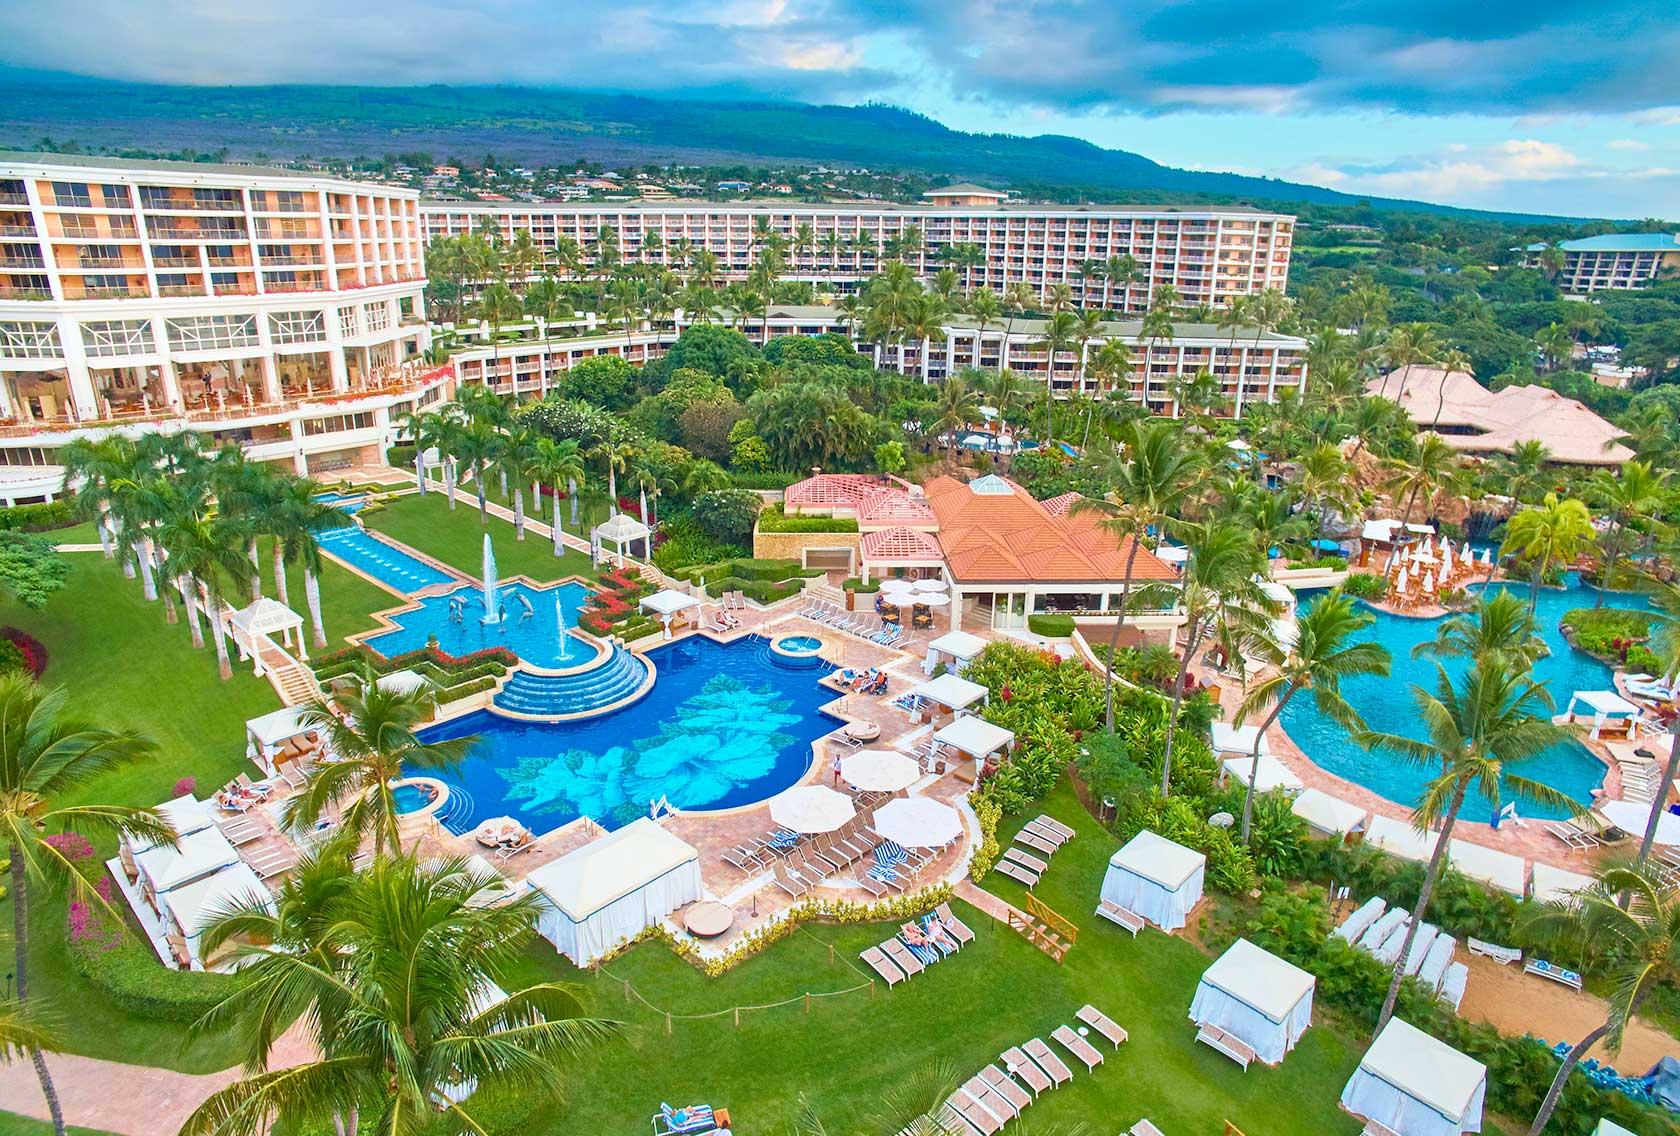 grand wailea insane hotel pool outside view